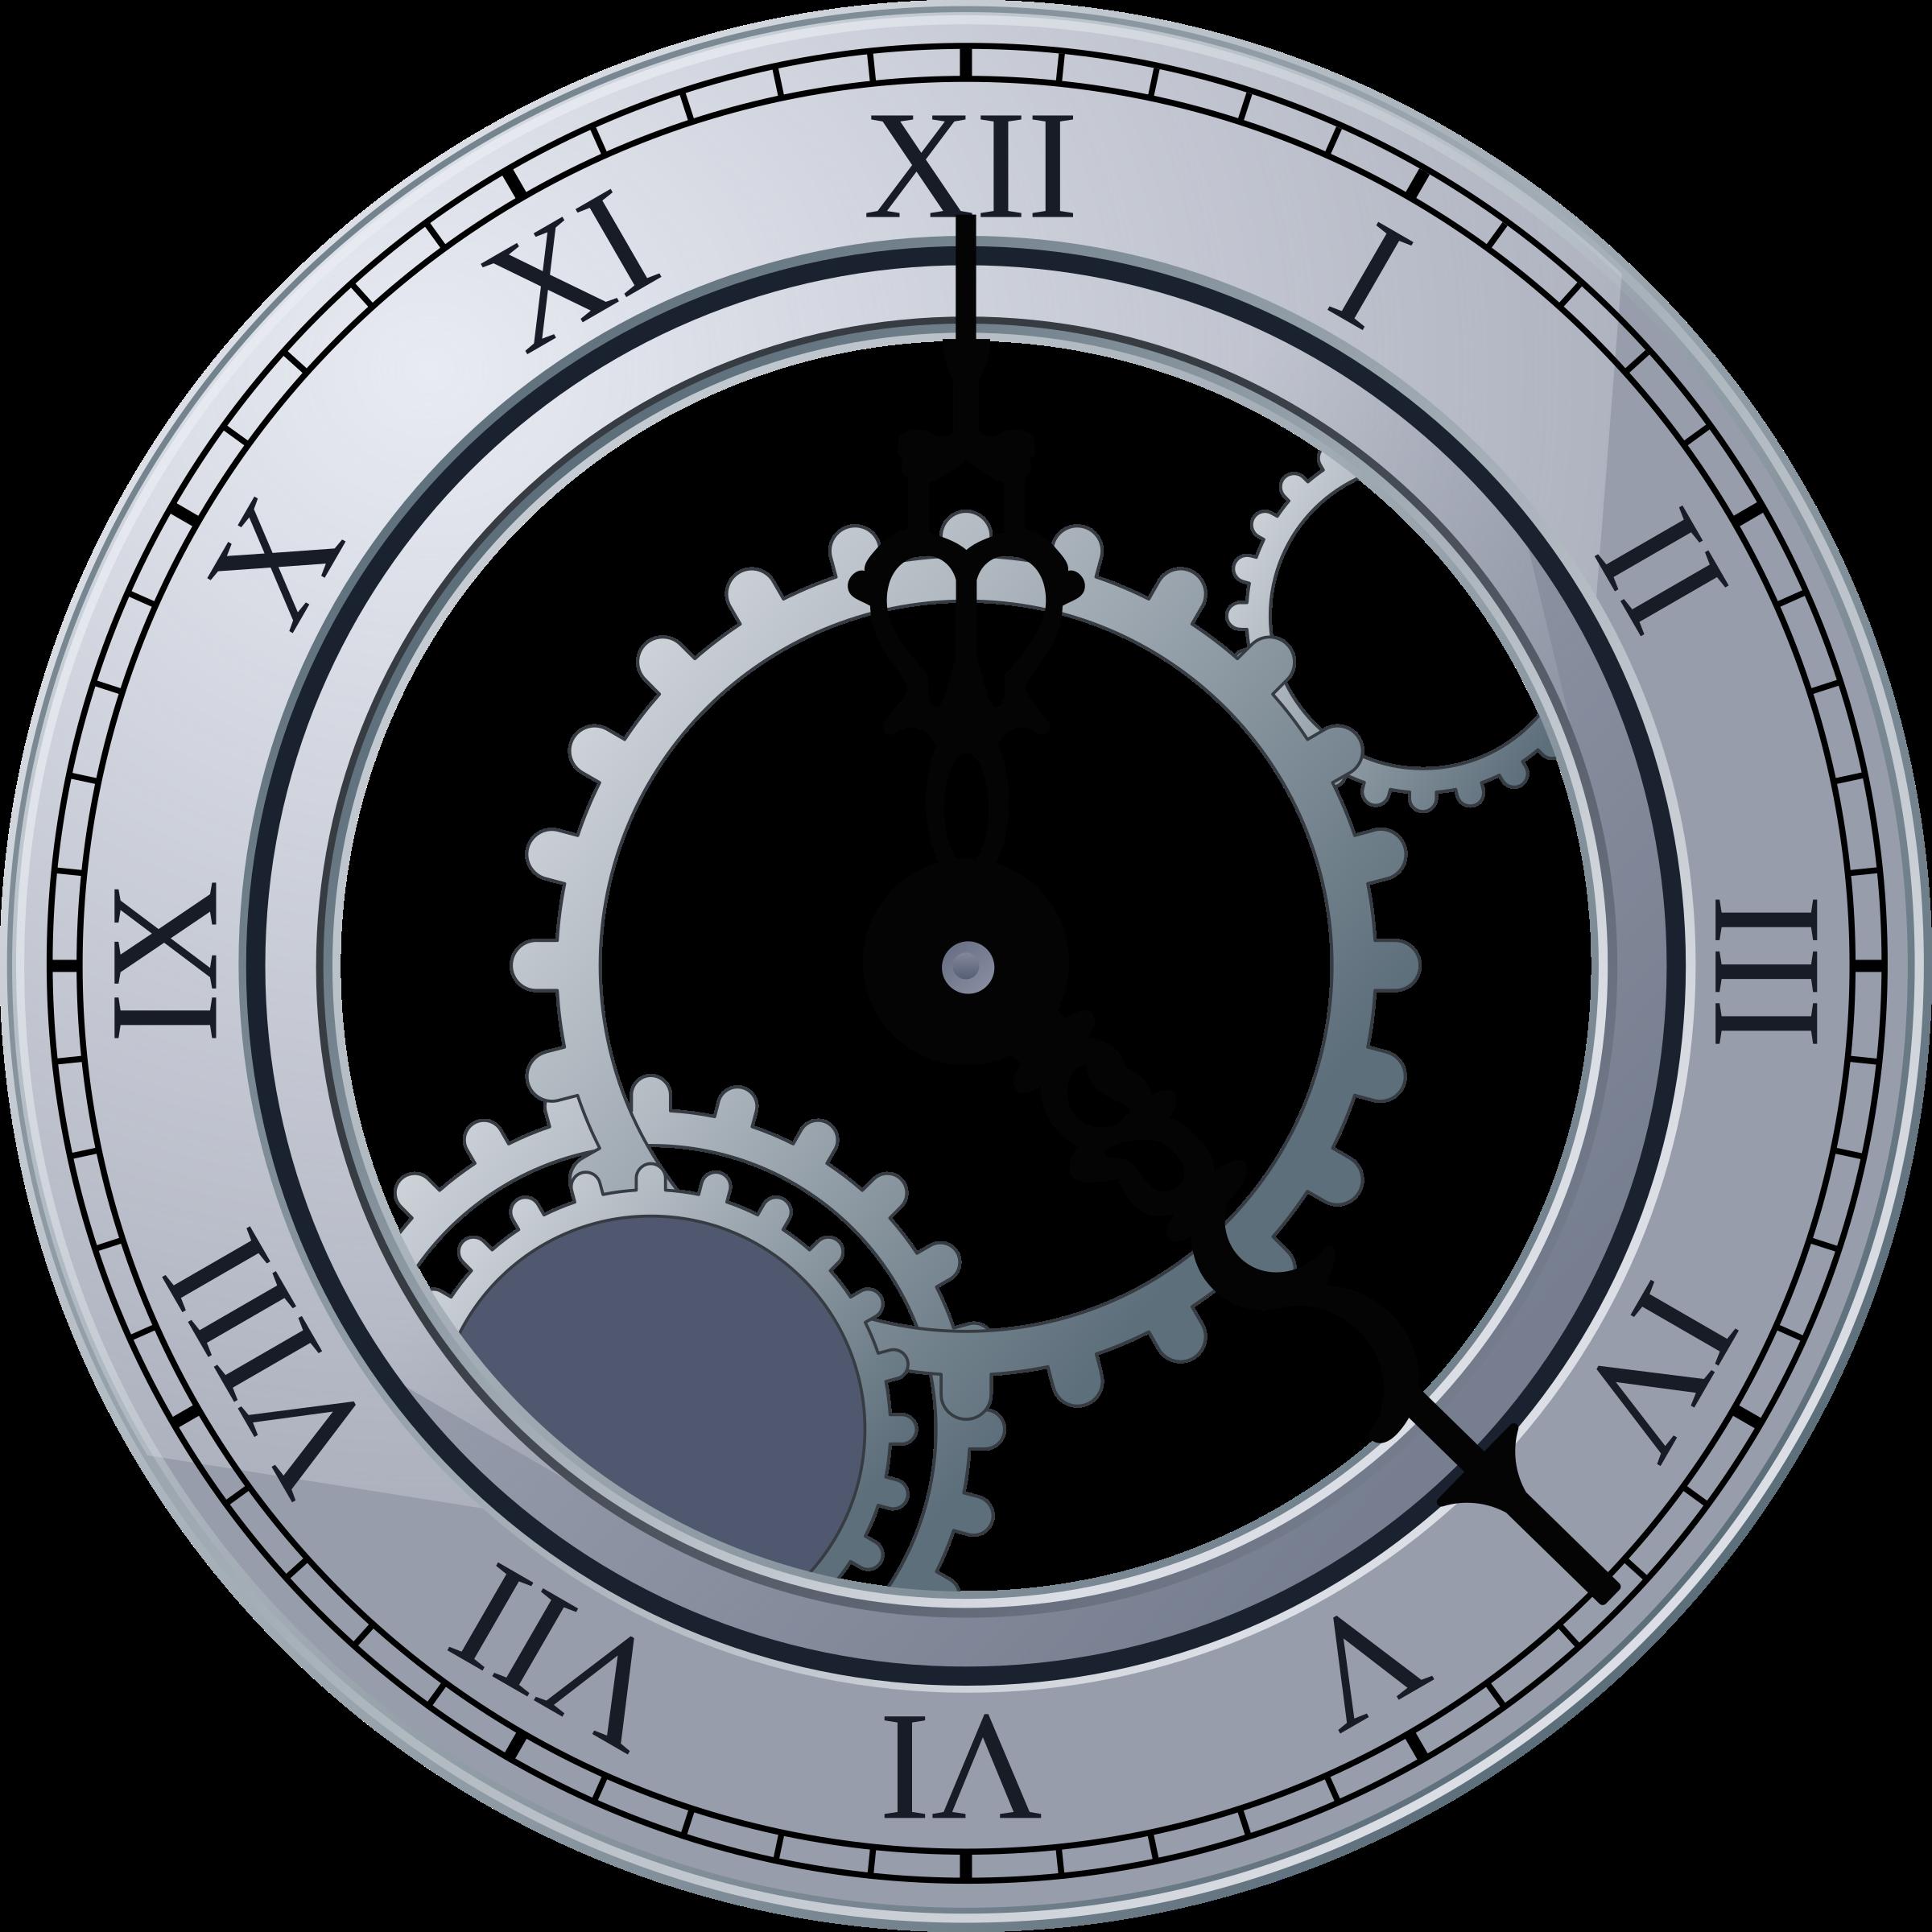 2400x2400 Antique Grandfather Clock Tattoo